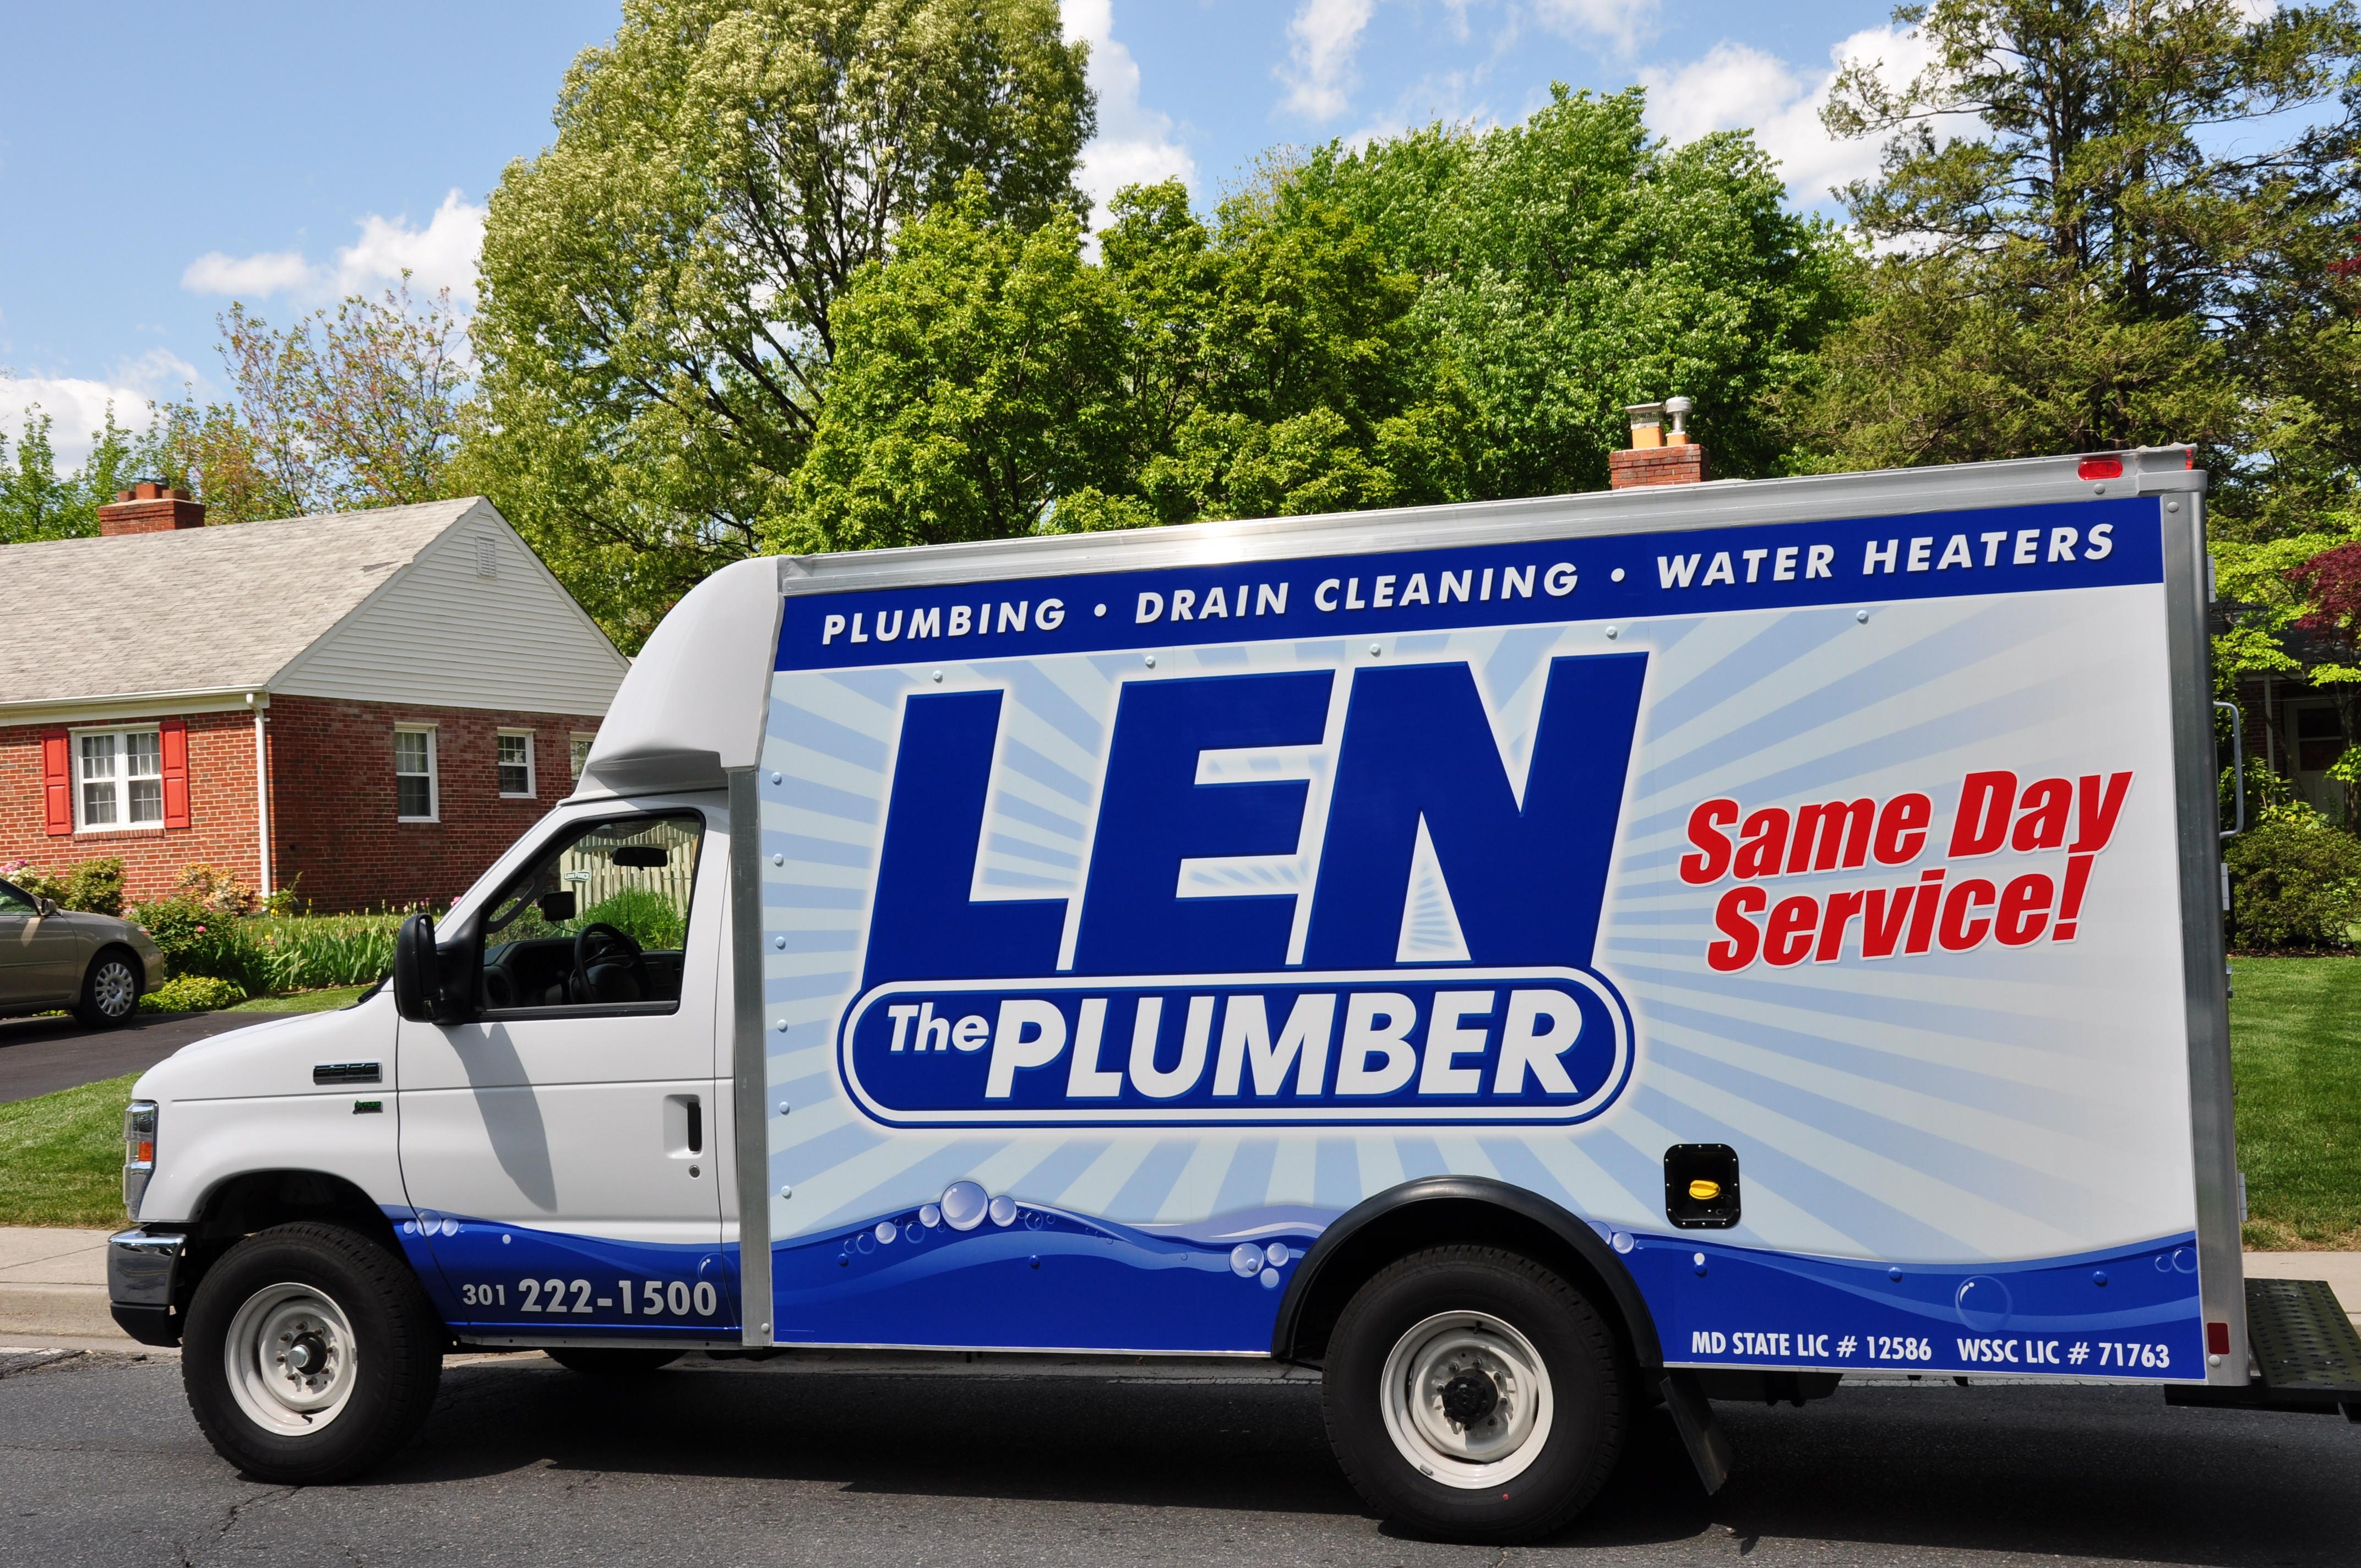 baltimore len near st plumbing mip com companies md ridgely the yp me plumber